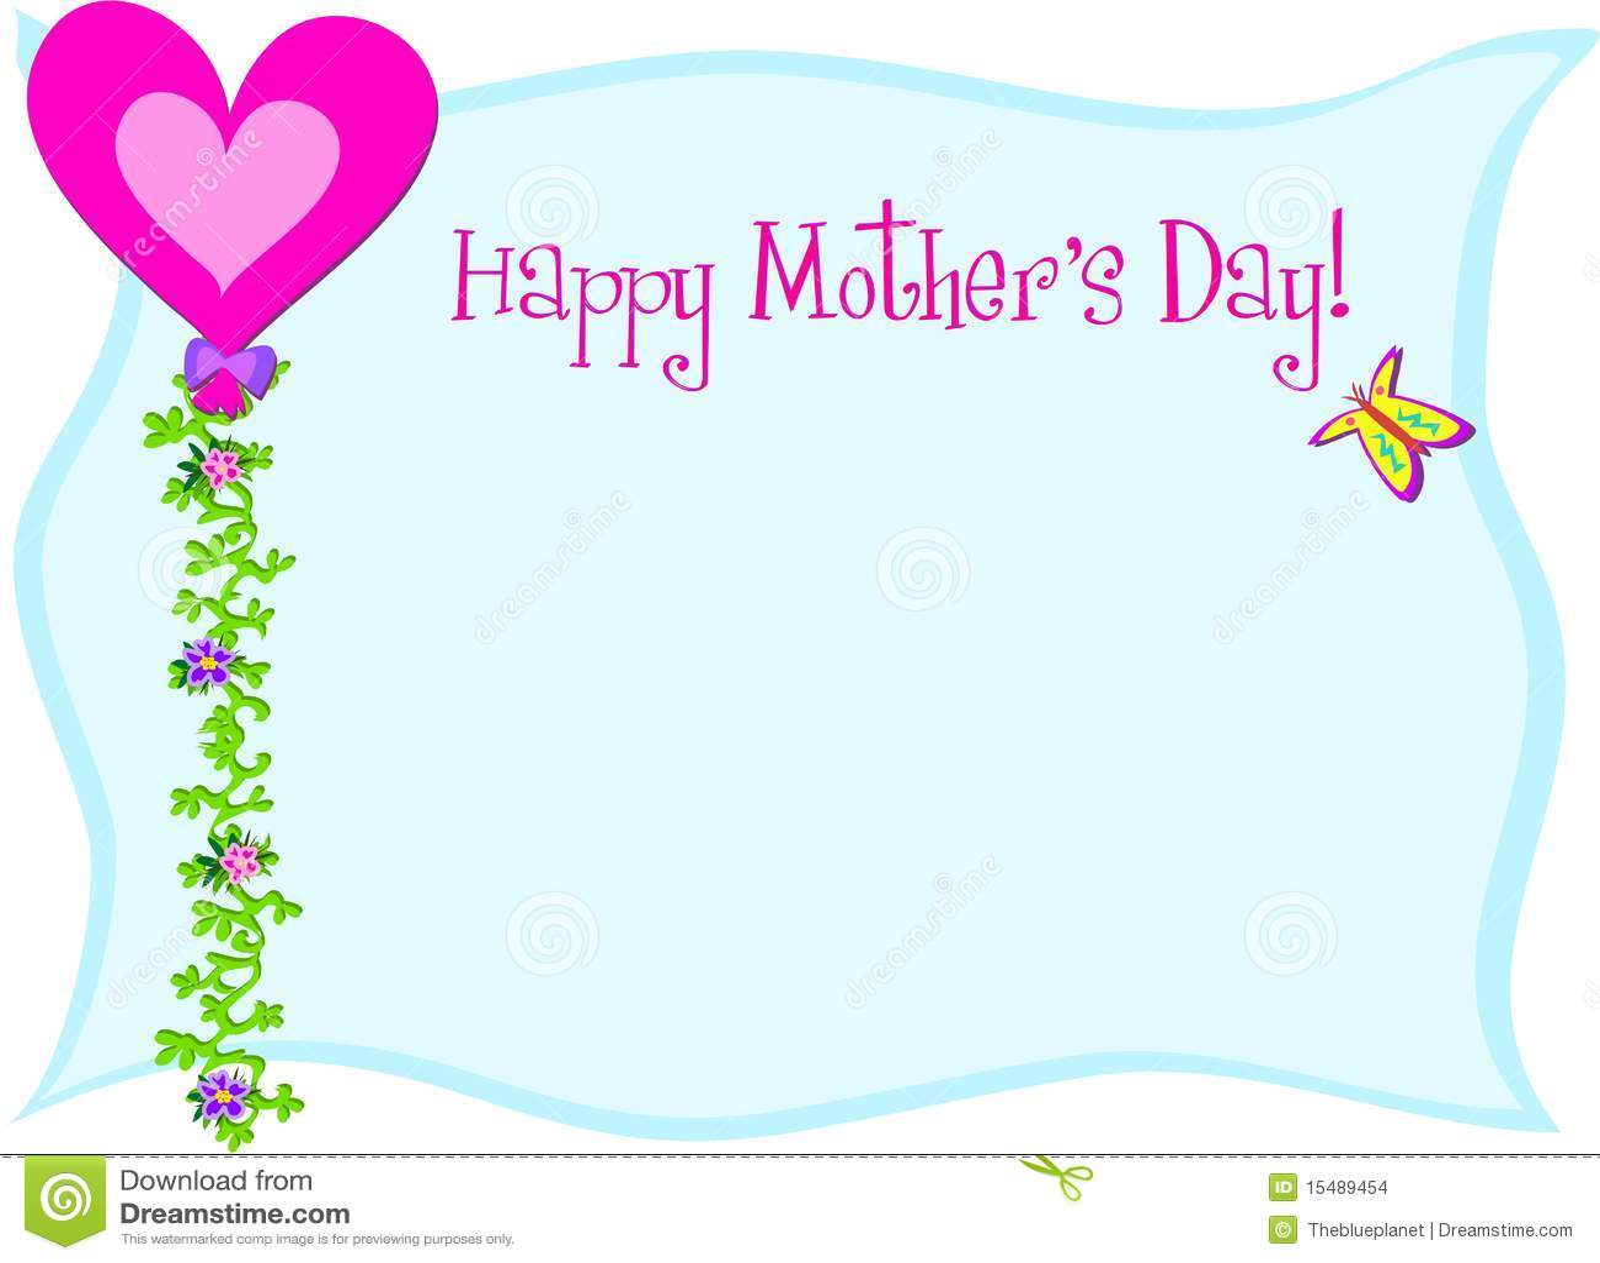 Happy Mothers Day Heart Balloon Stock Vector Illustration Of